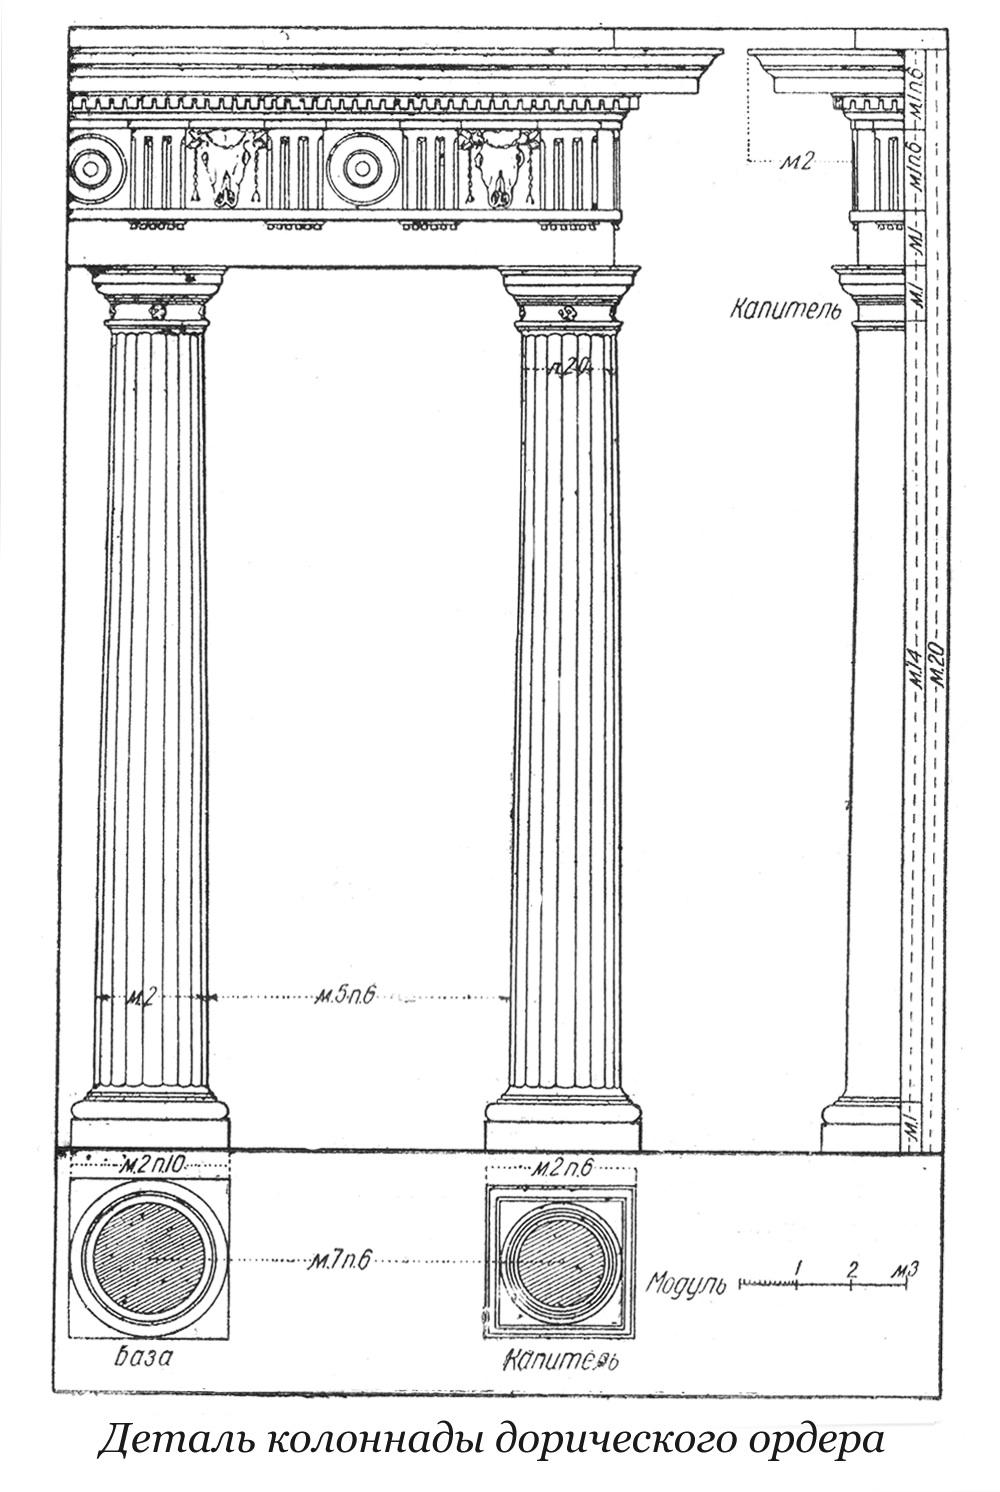 doric-order_colonnade-3